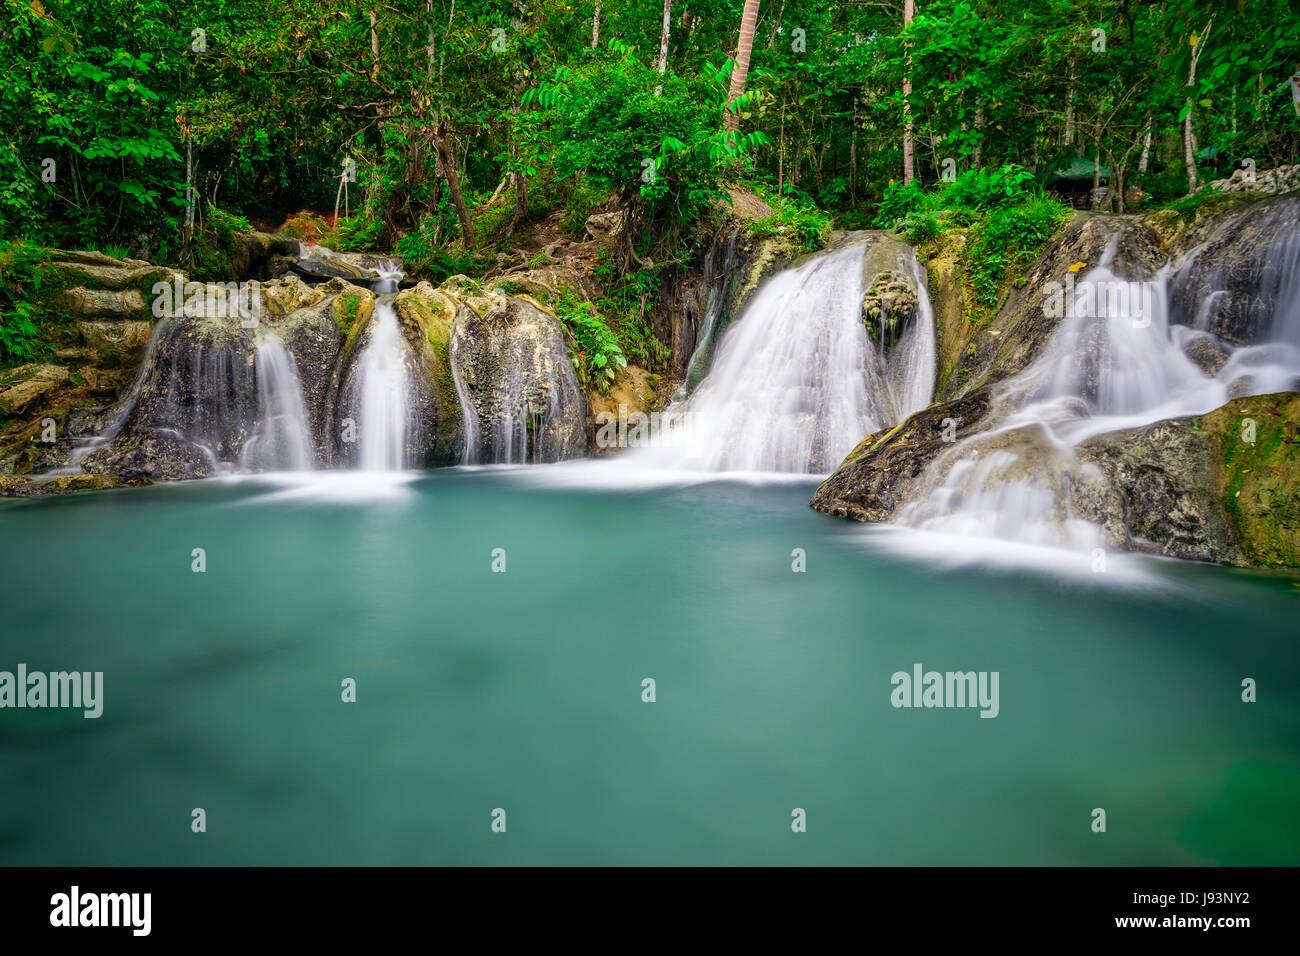 Hagimit Falls - Stock Image